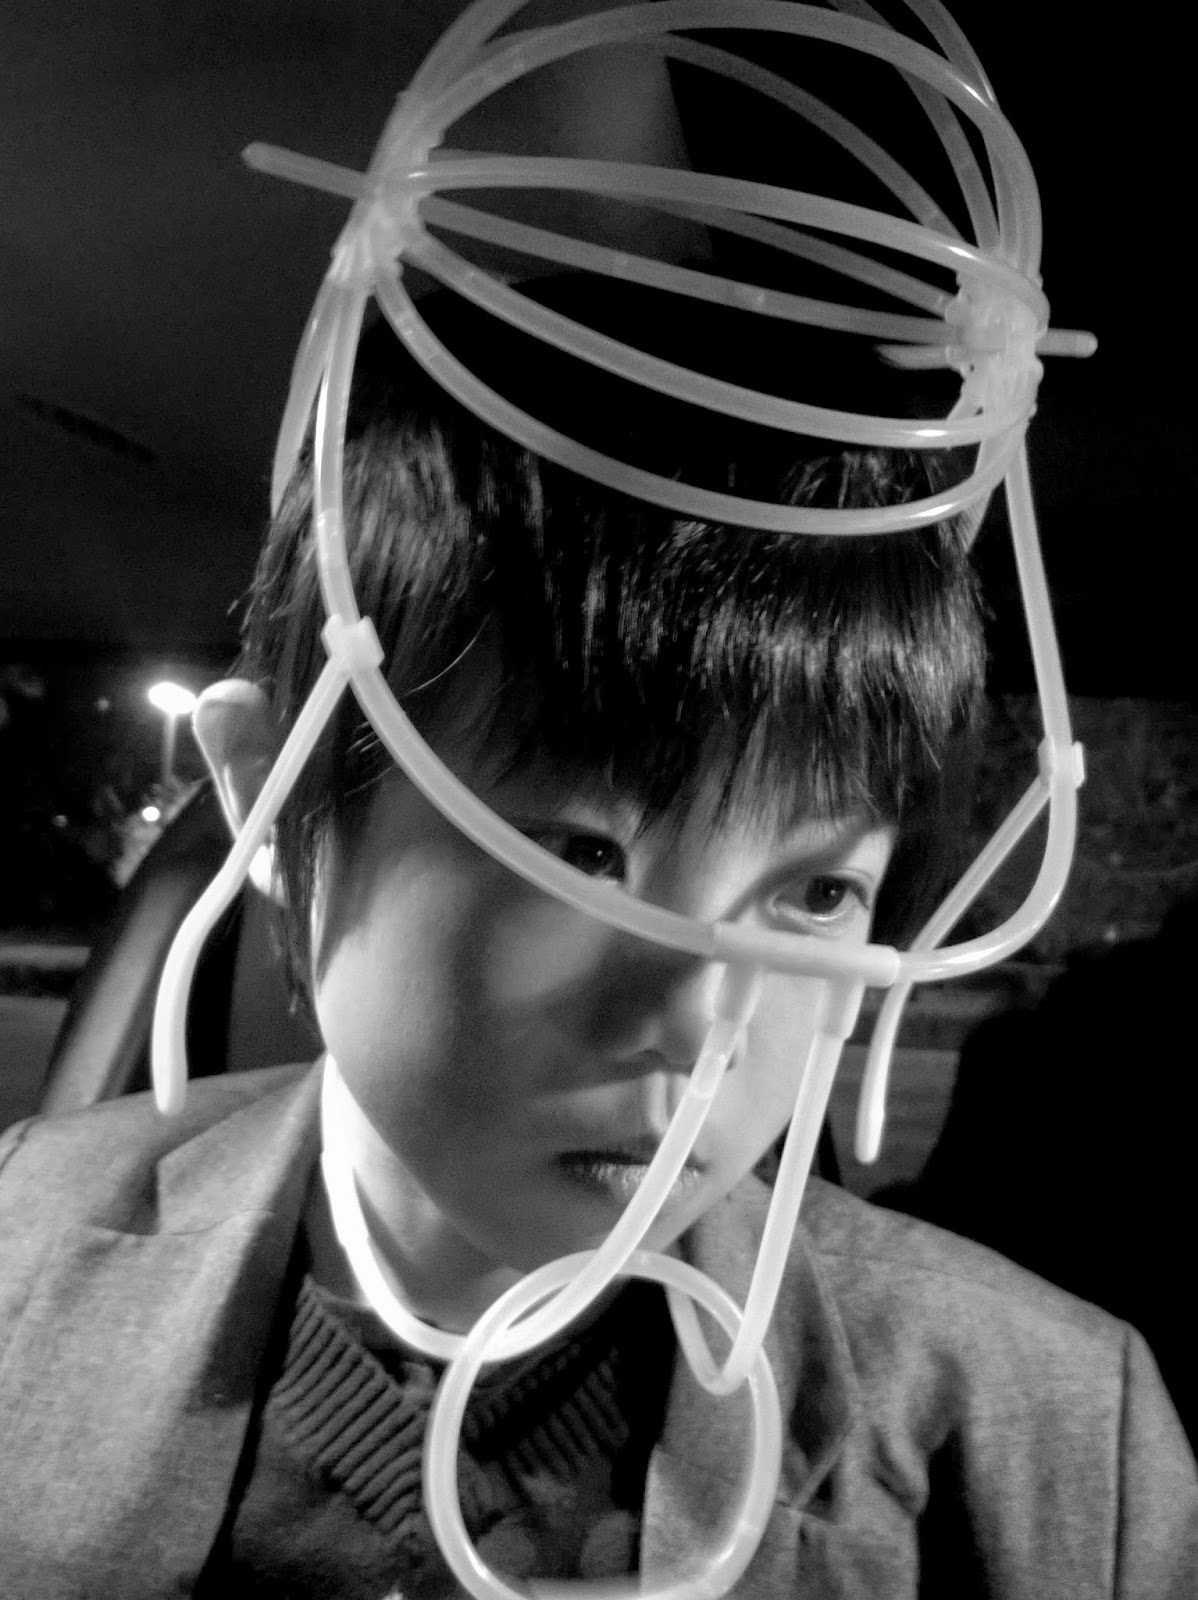 Glow stick helmet